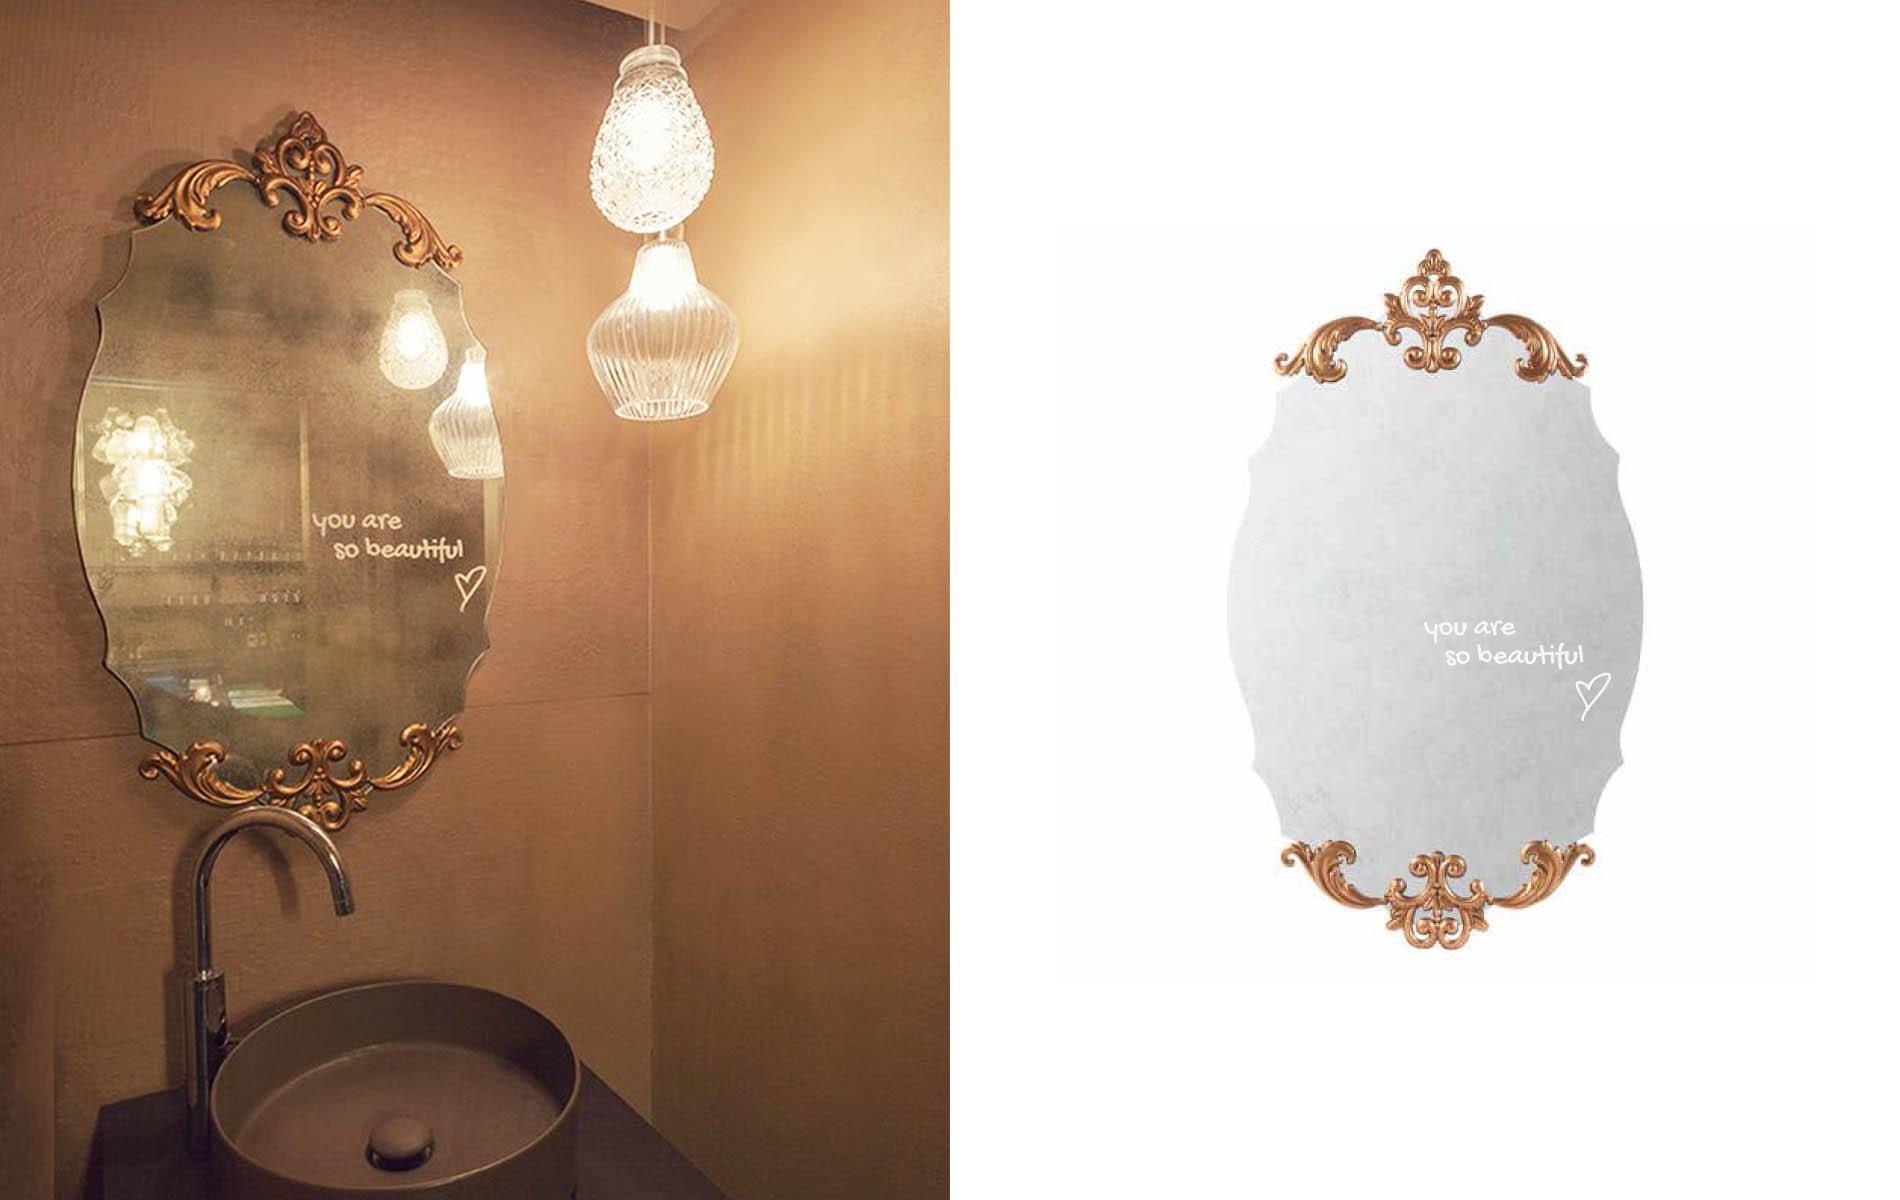 mintlab-brandidentity-justlove-mockup-specchio